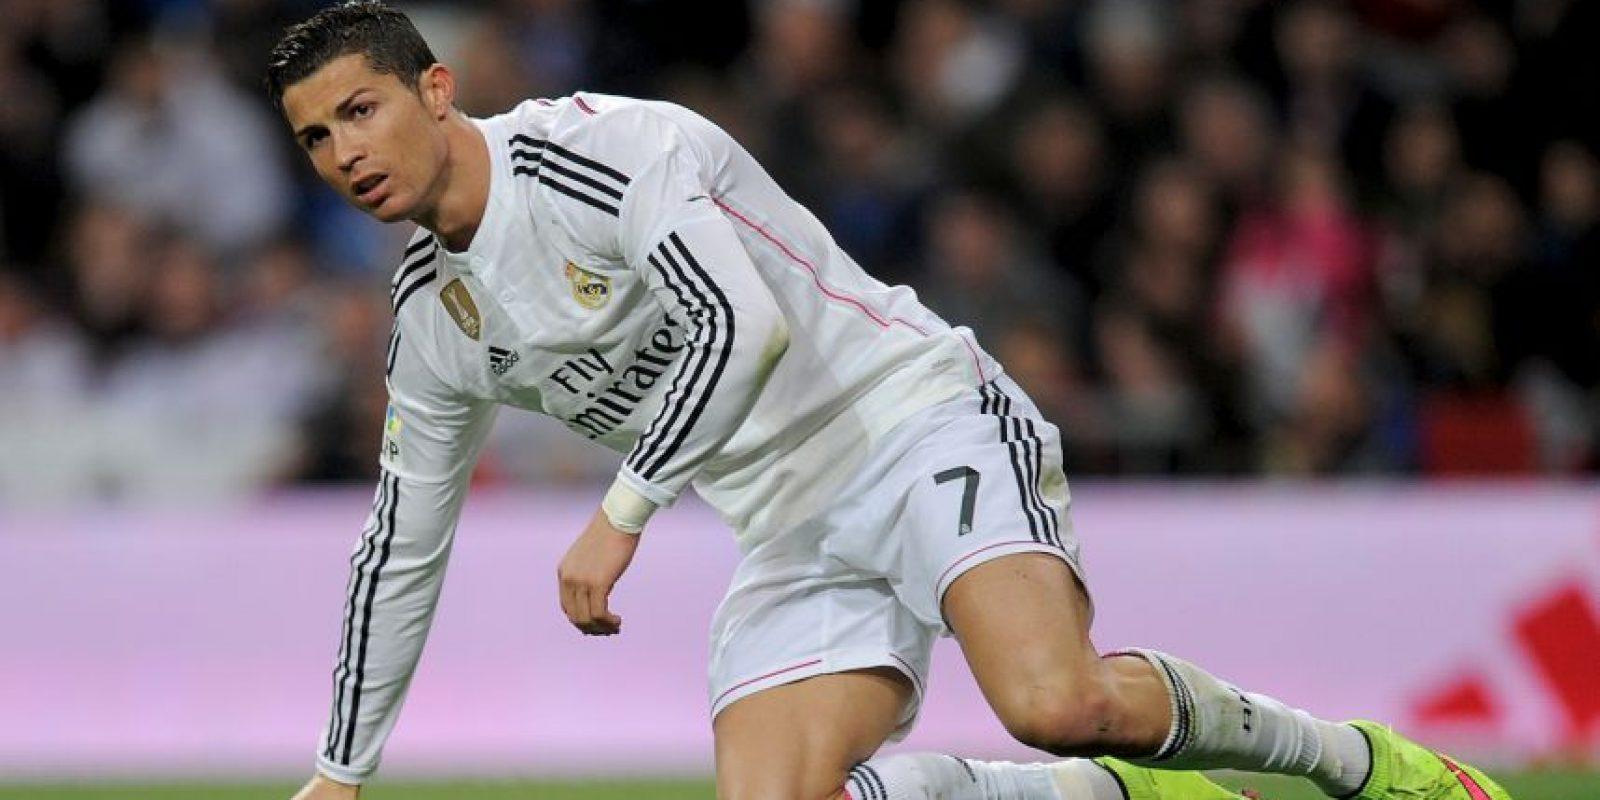 A mitad de la temporada, el portugués llevaba 25 goles. Foto:Getty Images